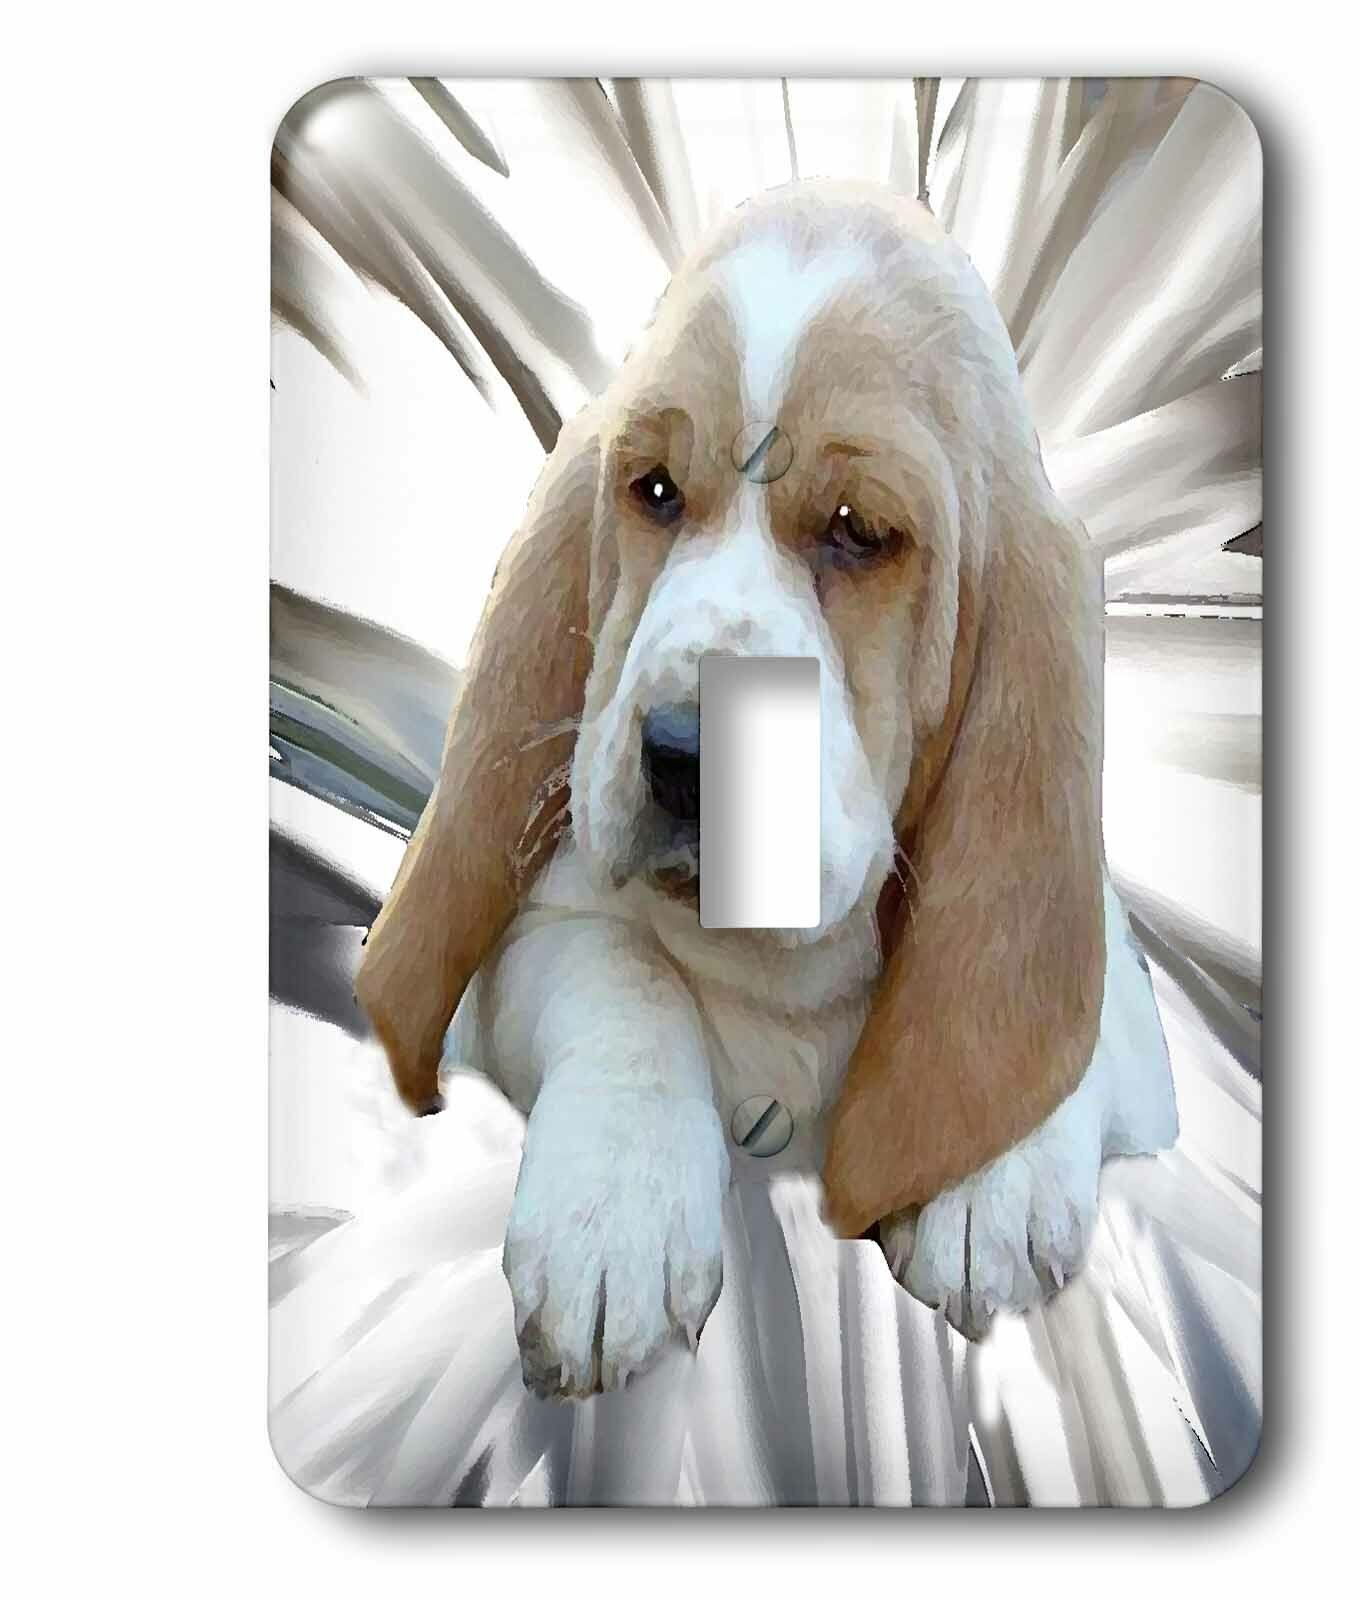 3drose Basset Hound Puppy 1 Gang Toggle Light Switch Wall Plate Wayfair